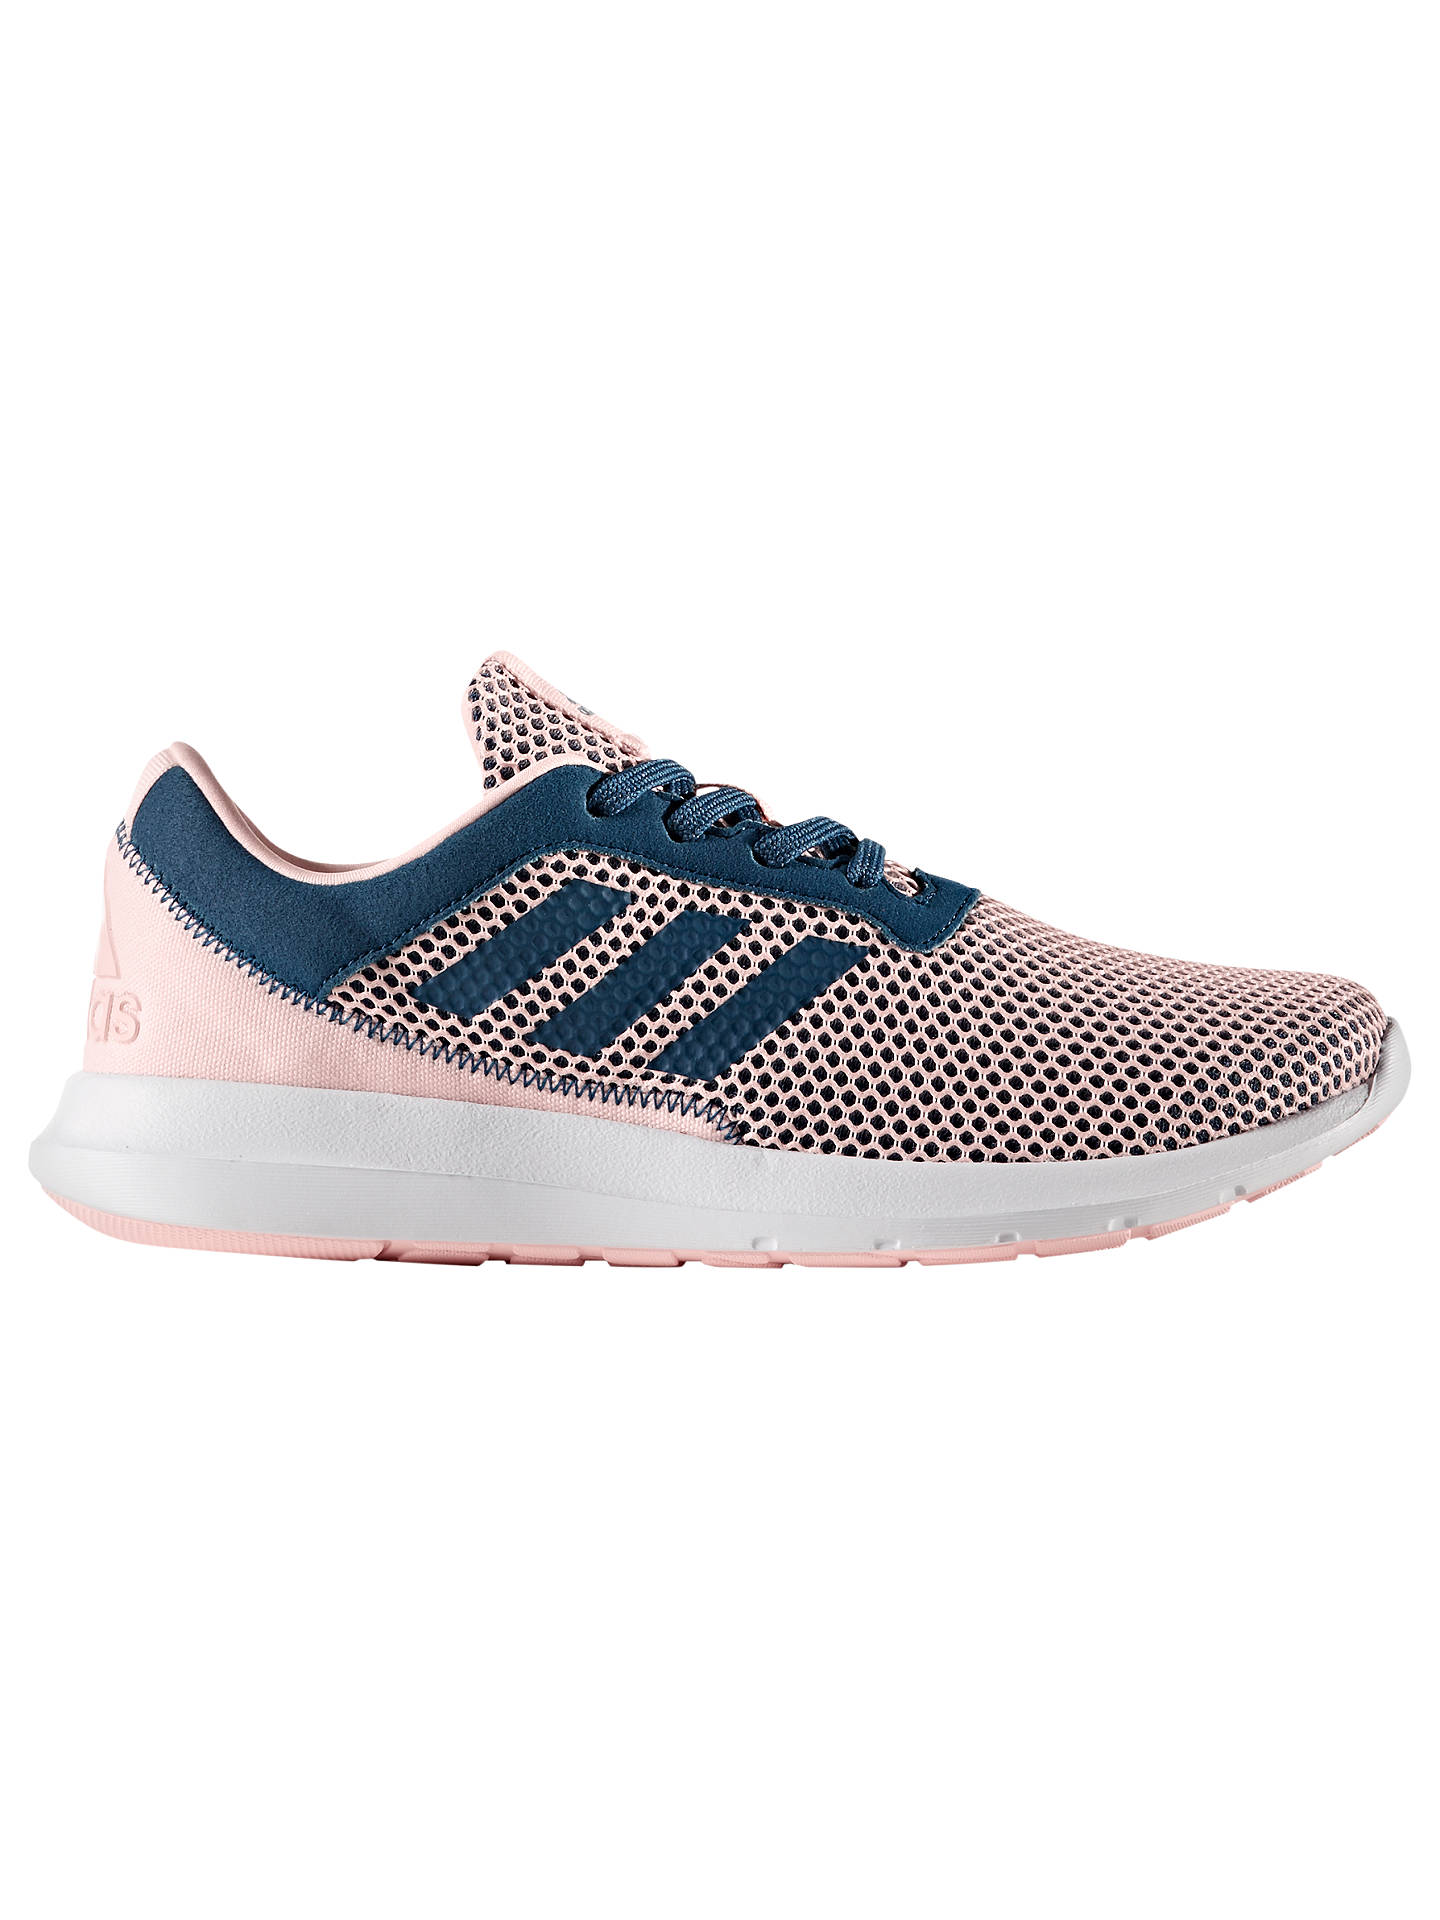 dfa08a040ce Buyadidas Element Refresh 3 Women s Running Shoes